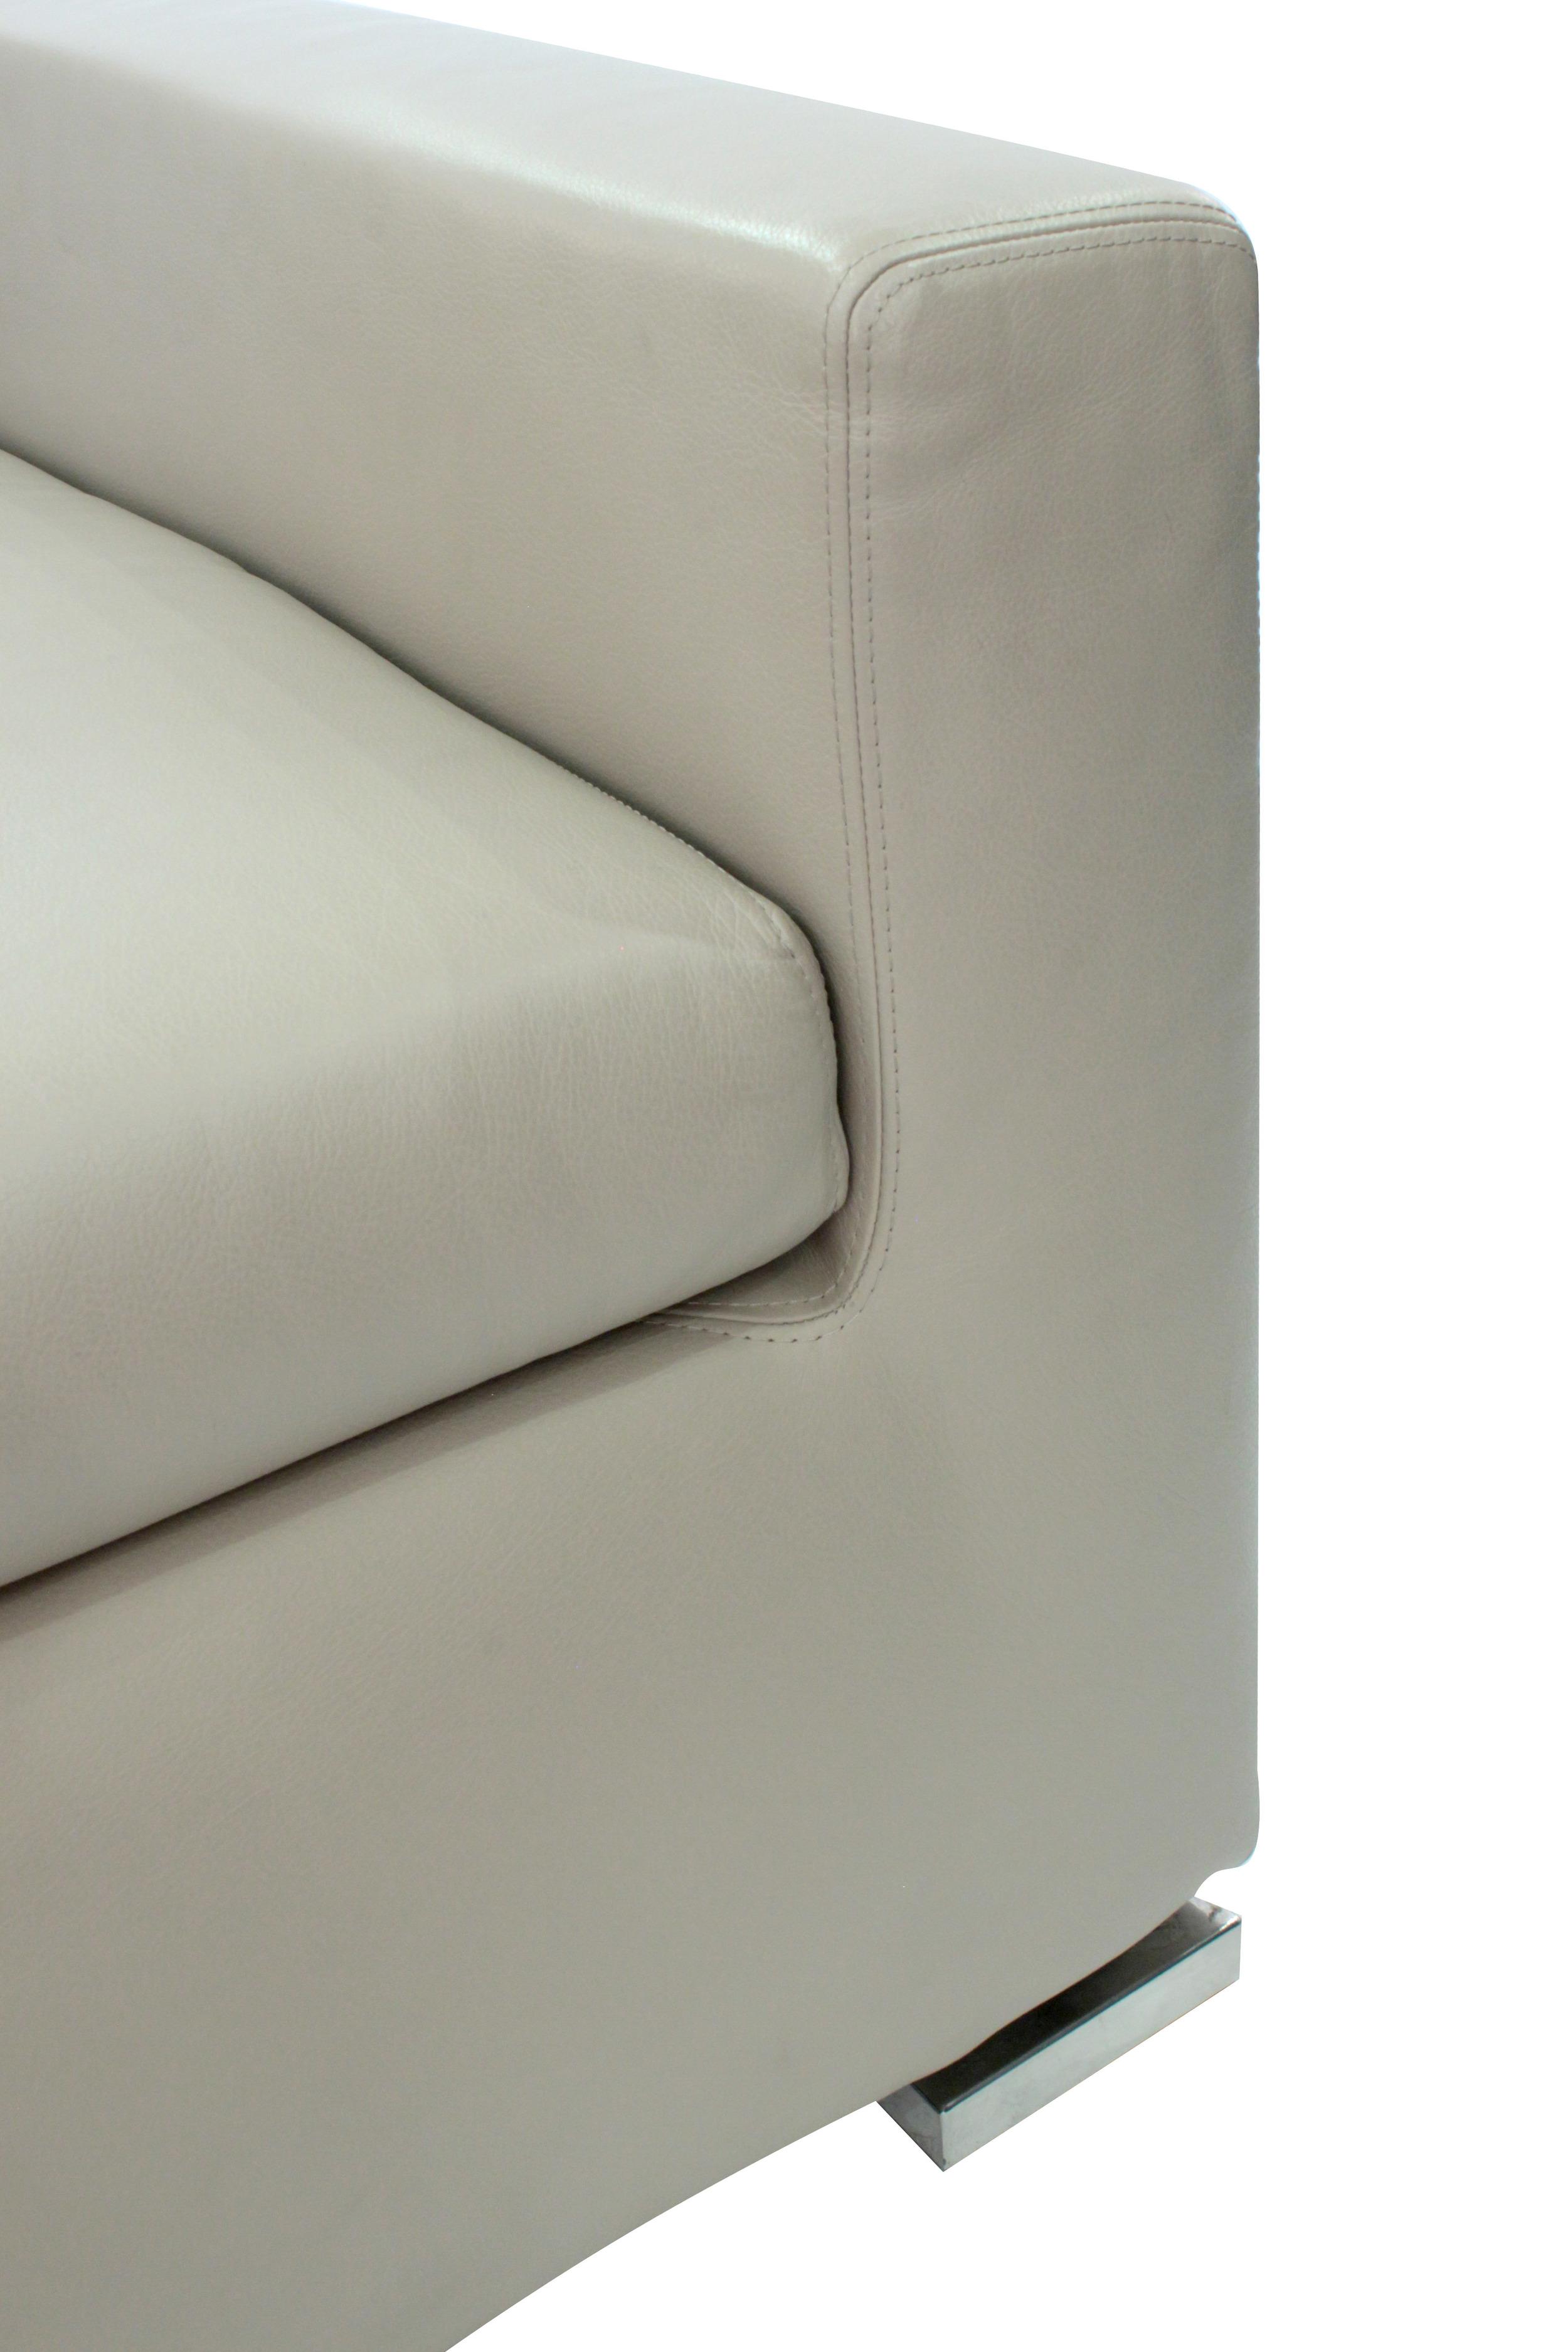 Minotti 65 cleanline lthr clubchairs54 detail6 hires.jpg